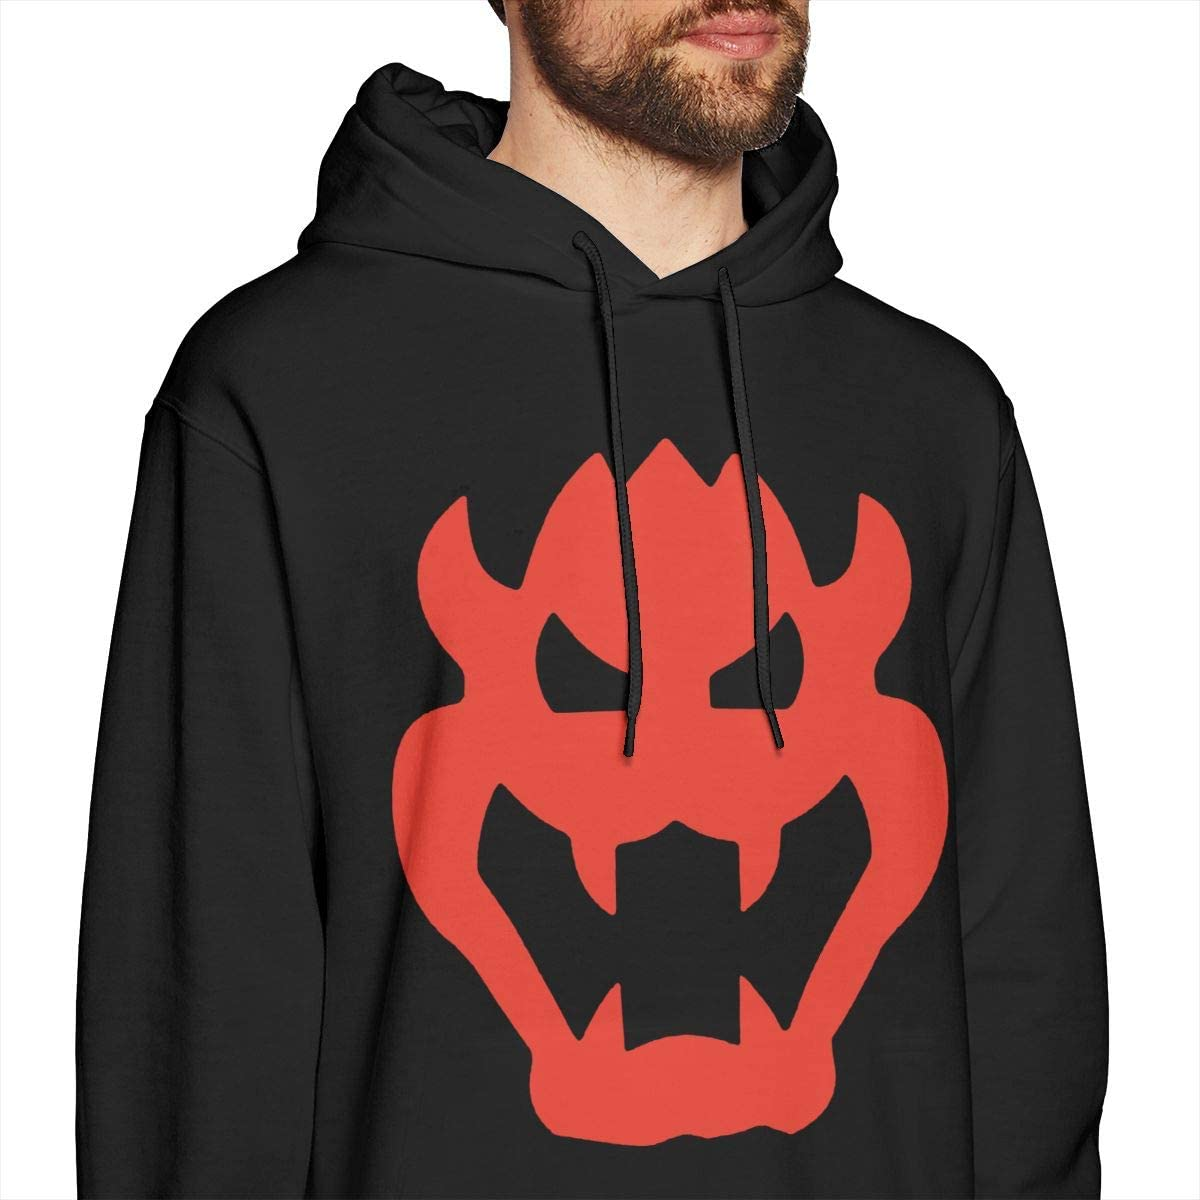 MUSICOT Bow-ser Mens Pullover Hooded Sweatshirt Cozy Sport Outwear Black